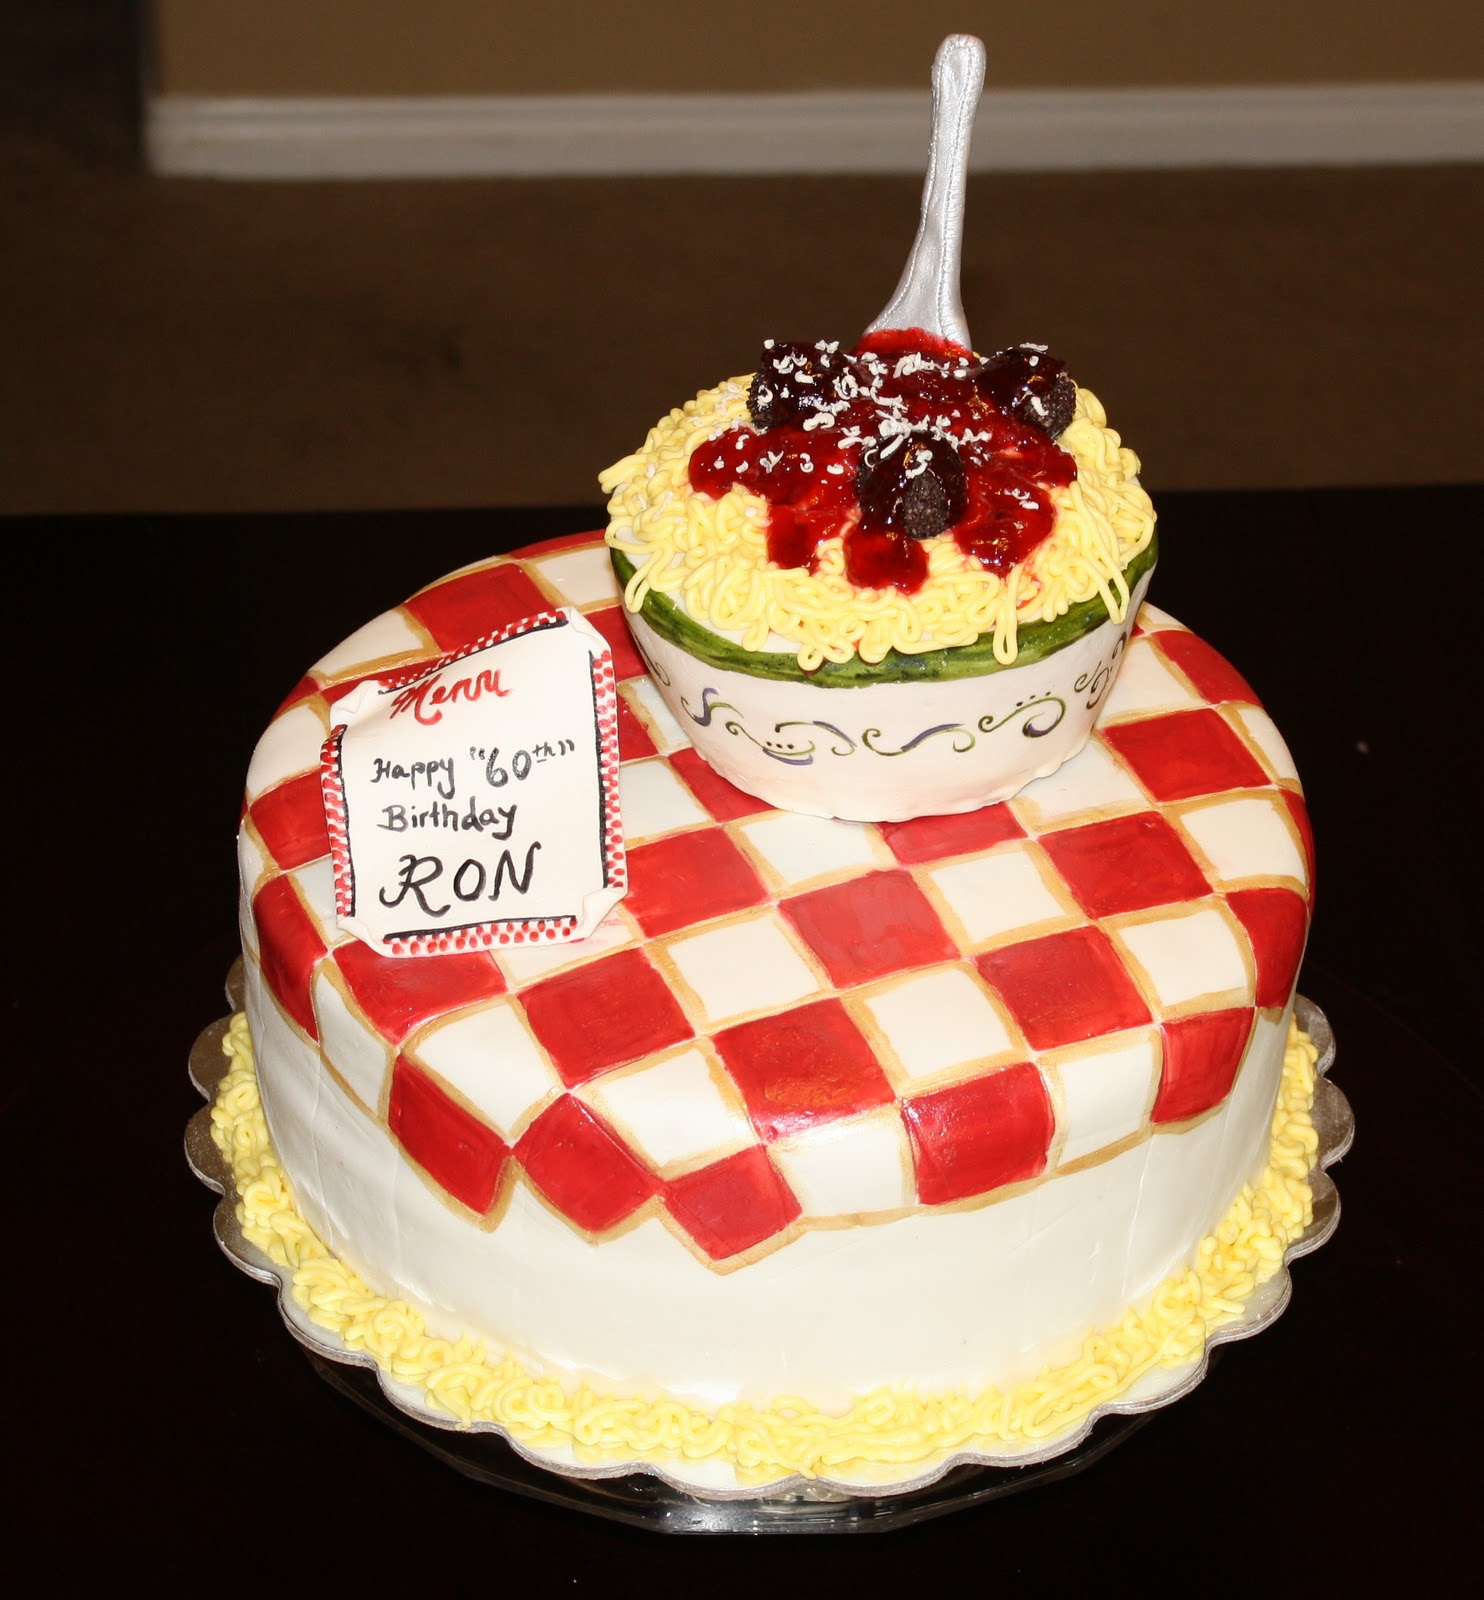 It's Cake!: Birthday & Other Cakes